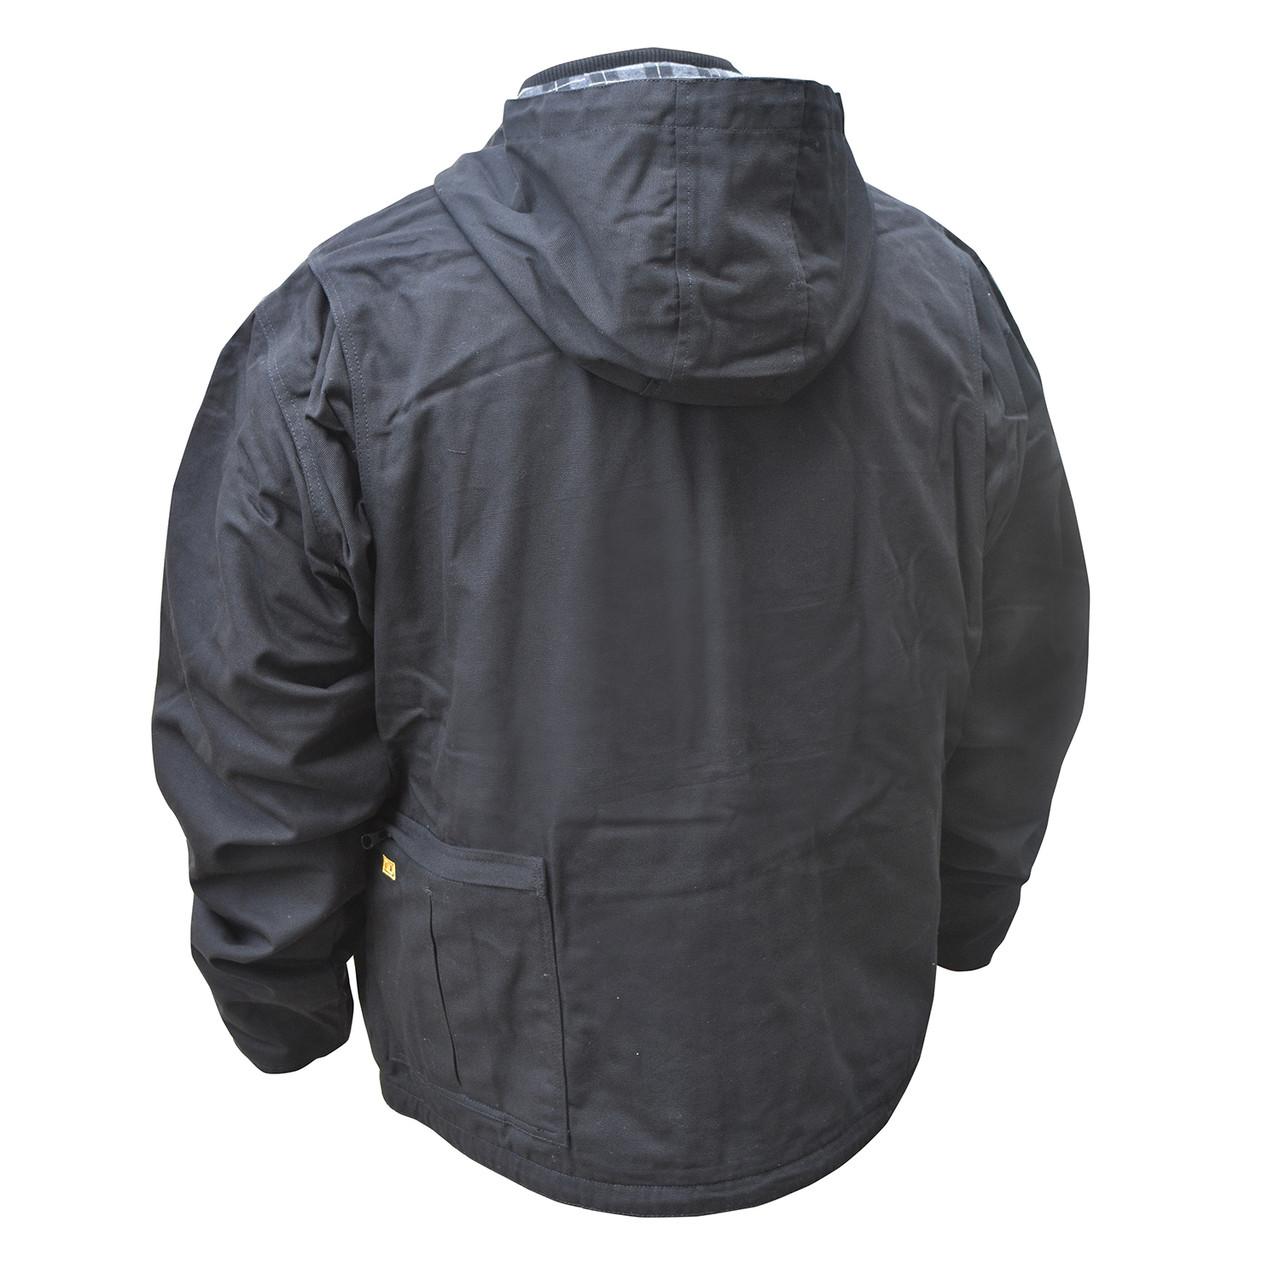 DEWALT DCHJ076ABB-XL Heated Heavy Duty Work Coat Black XL